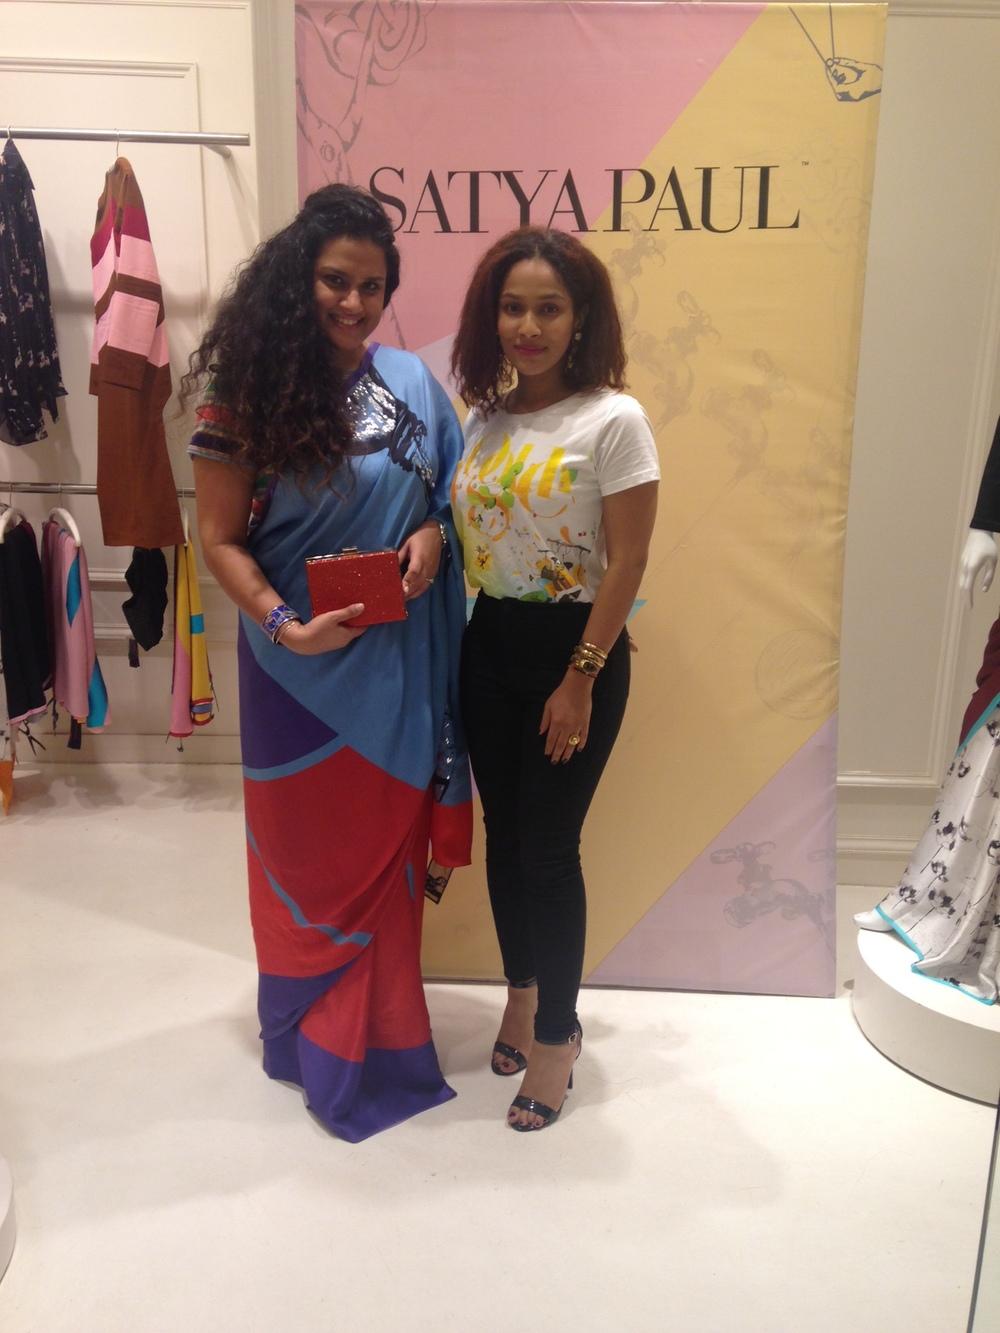 With Satya Paul's Creative Director, Masaba Gupta  Saree & Clutch both from Satya Paul